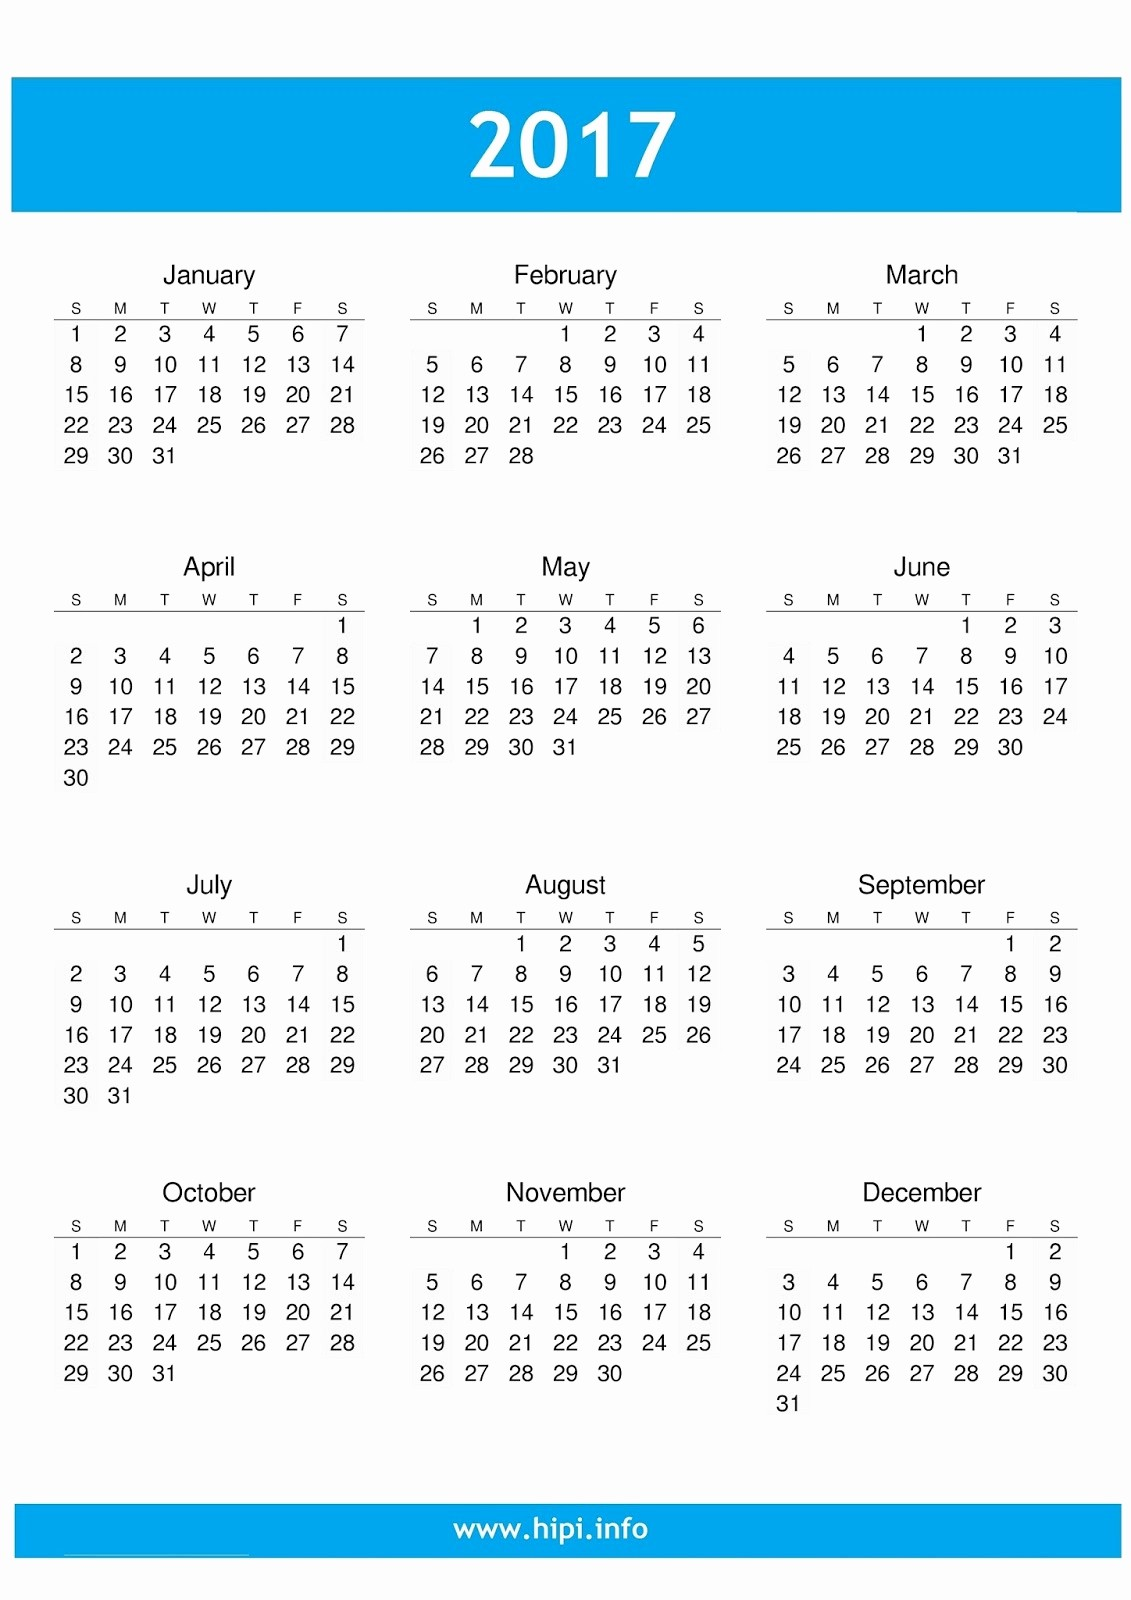 Free Download Of 2017 Calendar Inspirational Twitter Headers Covers Wallpapers Calendars